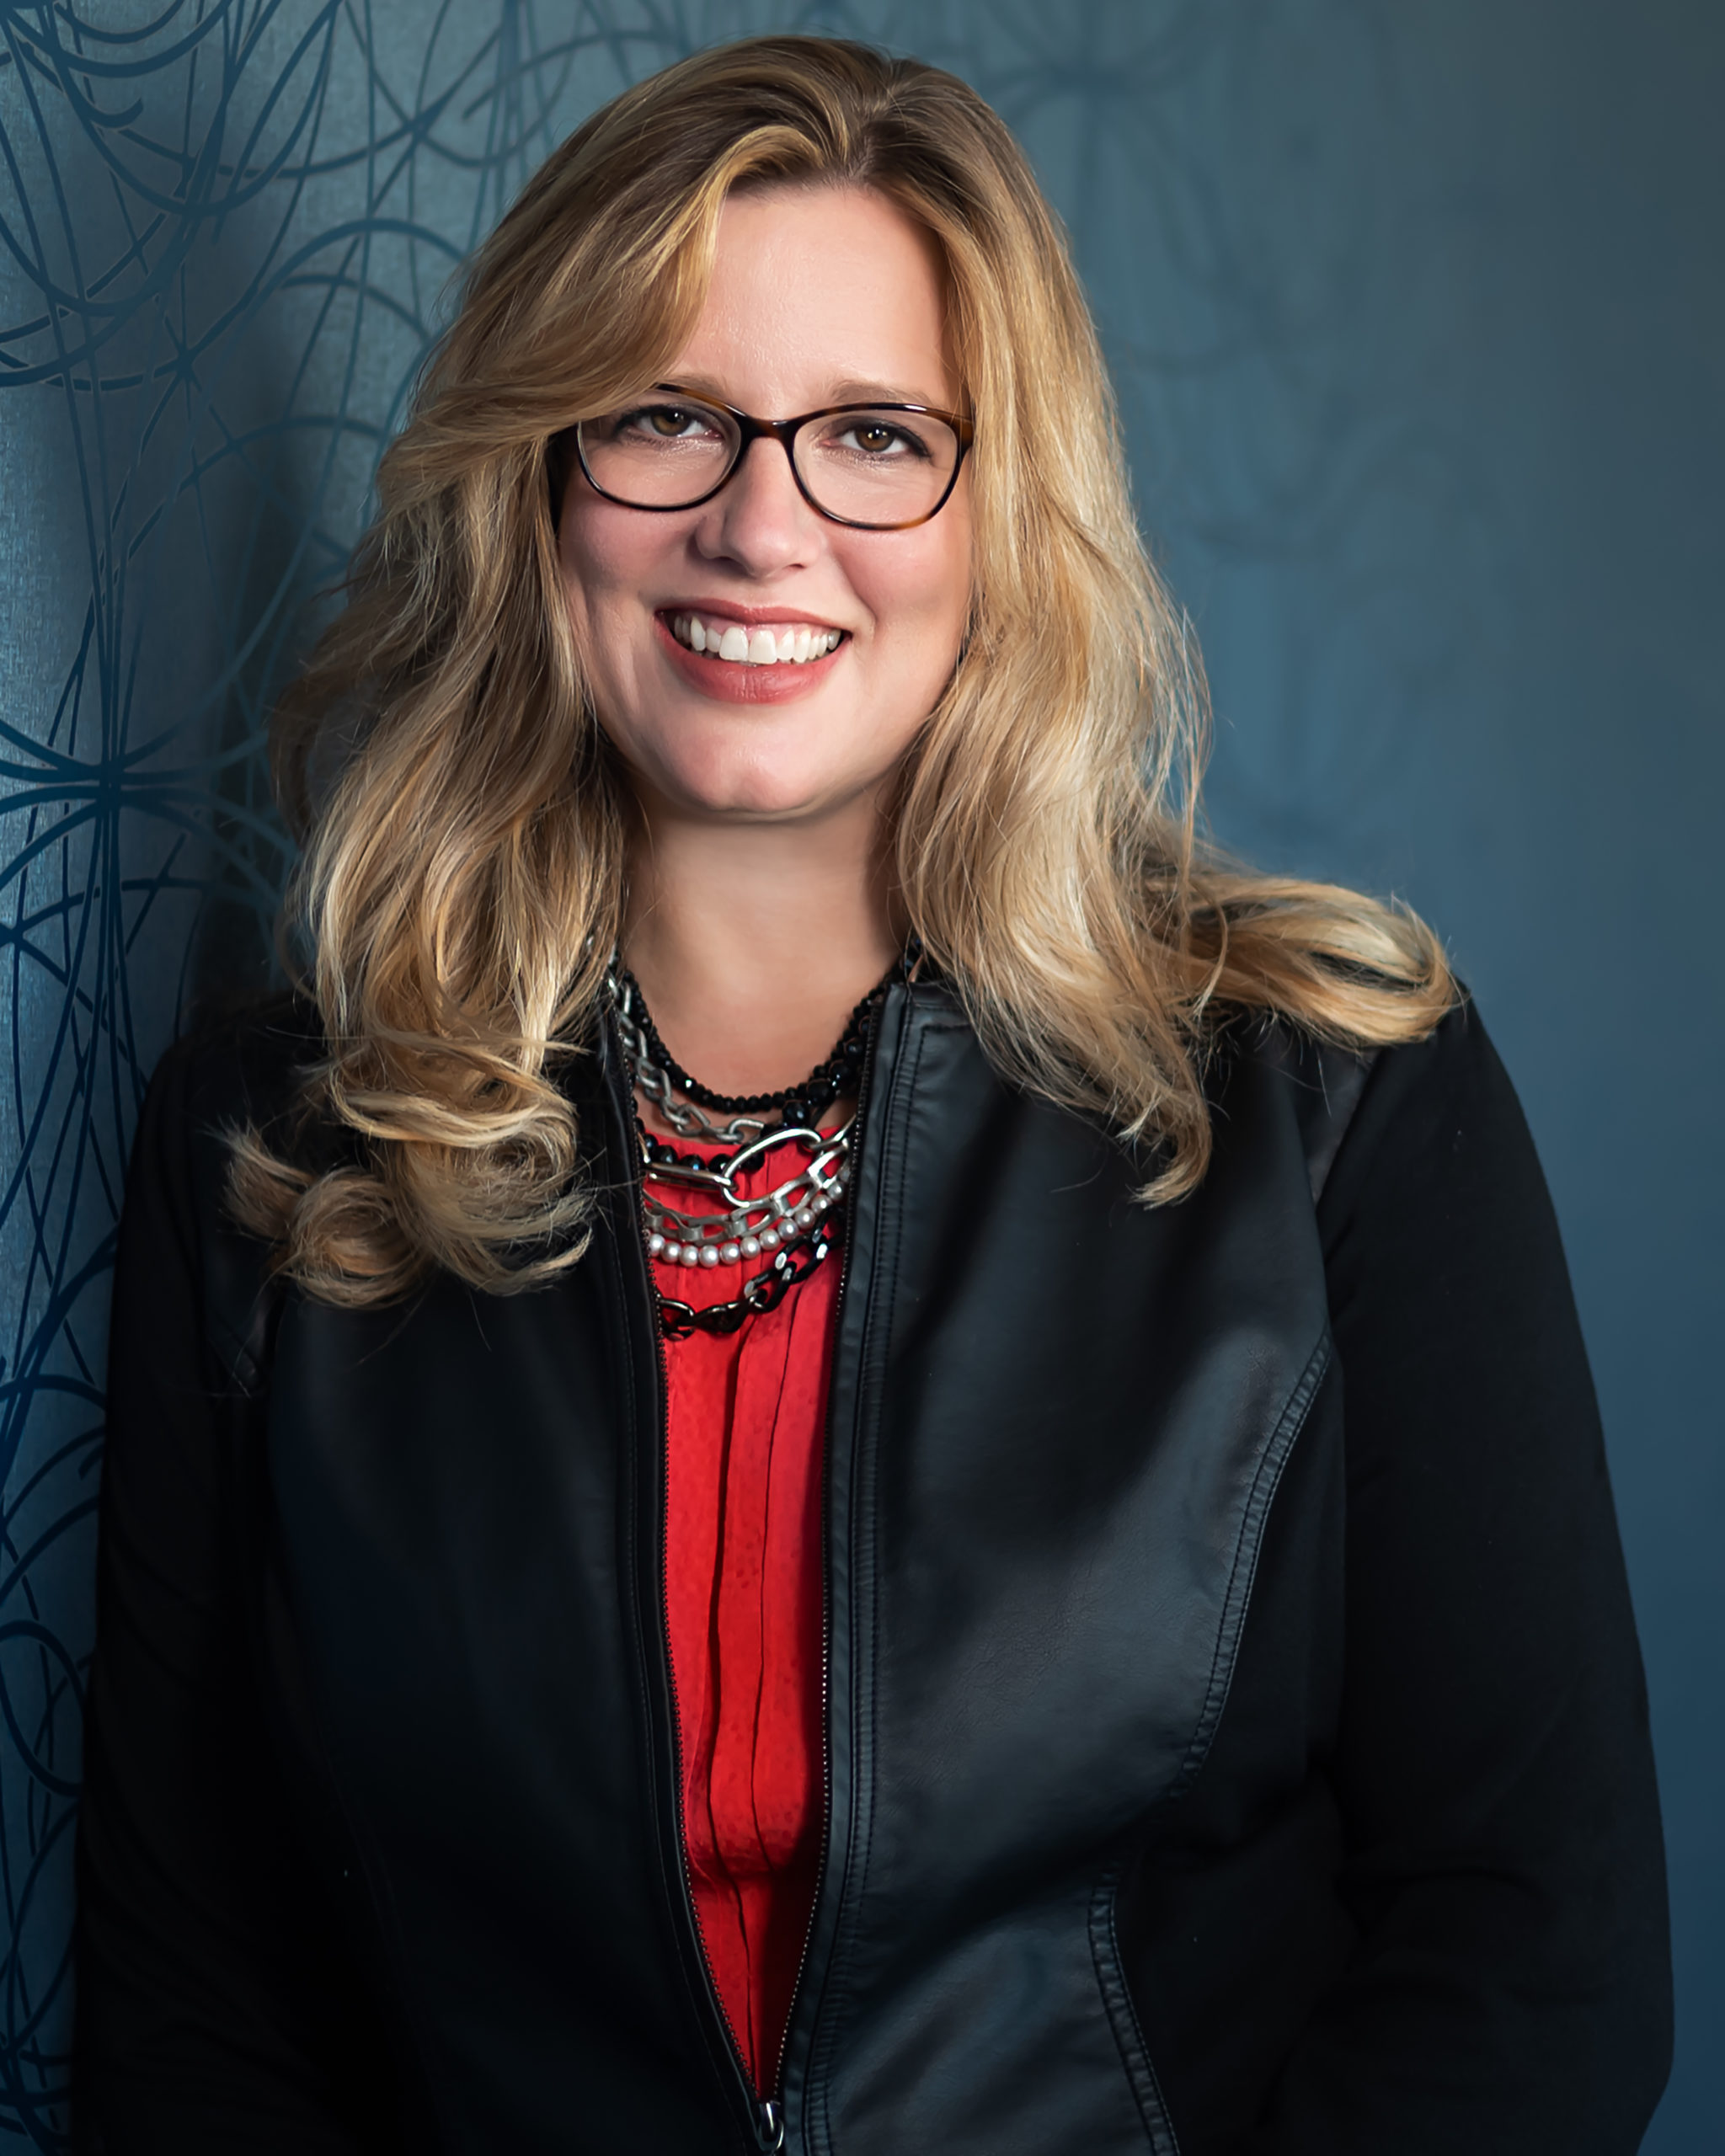 Kendra Corman